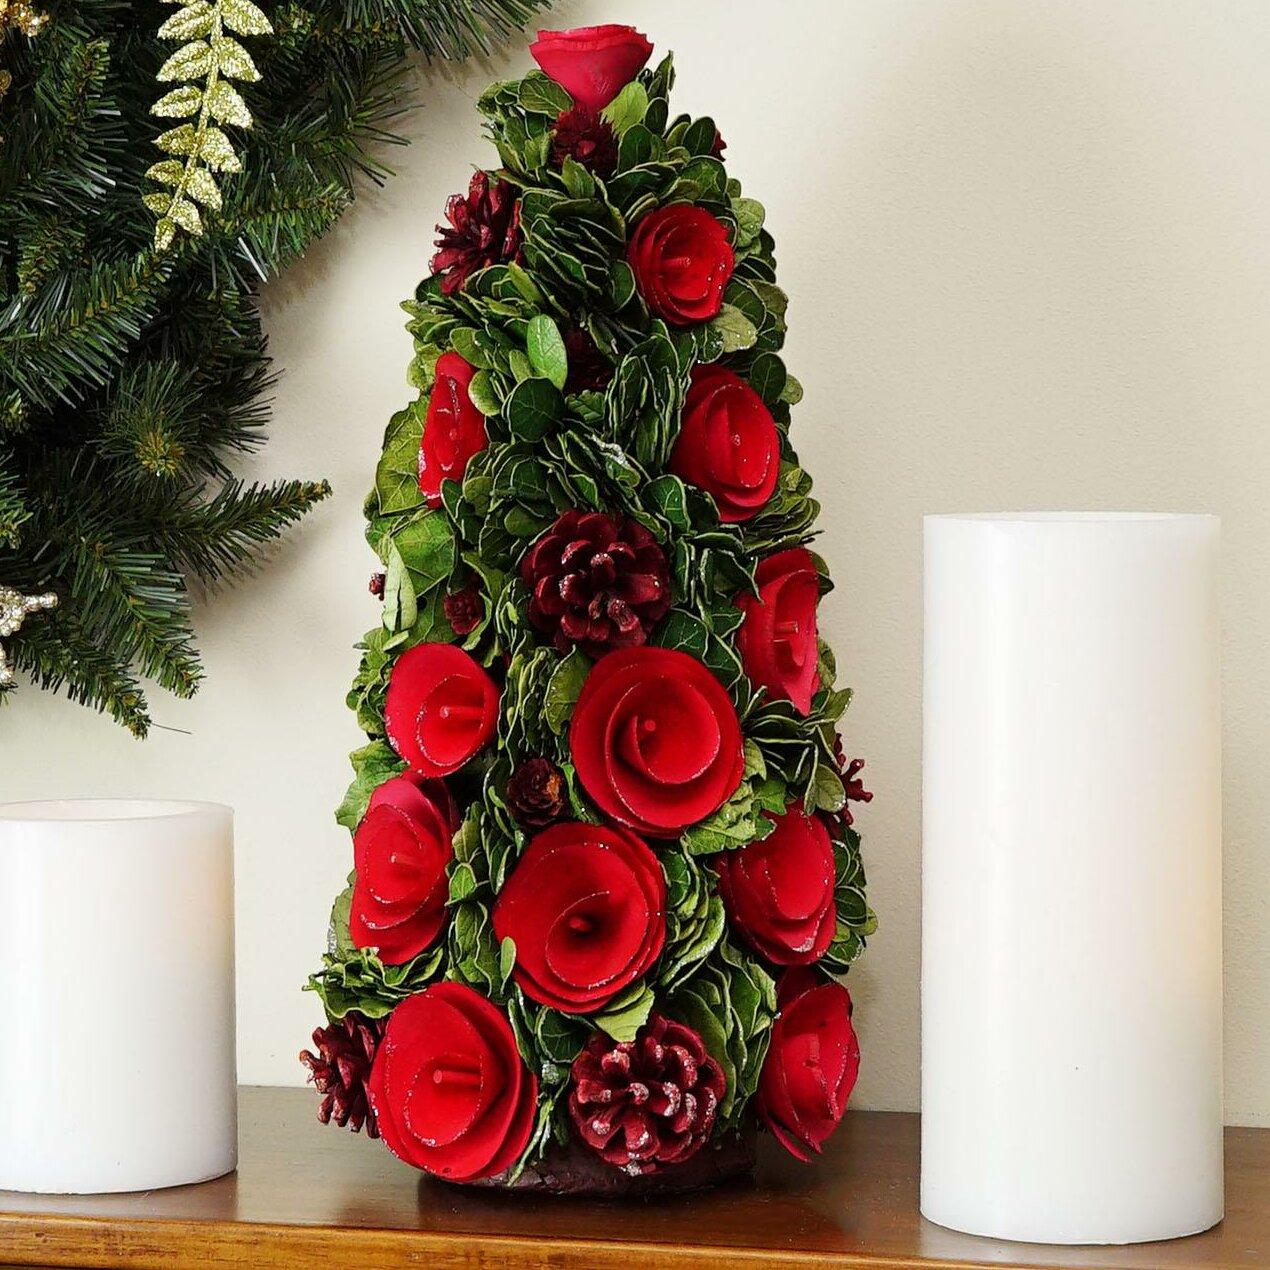 Northlight Desktop Rose Flower And Pine Cones Christmas Tree Decorative Plant Wayfair